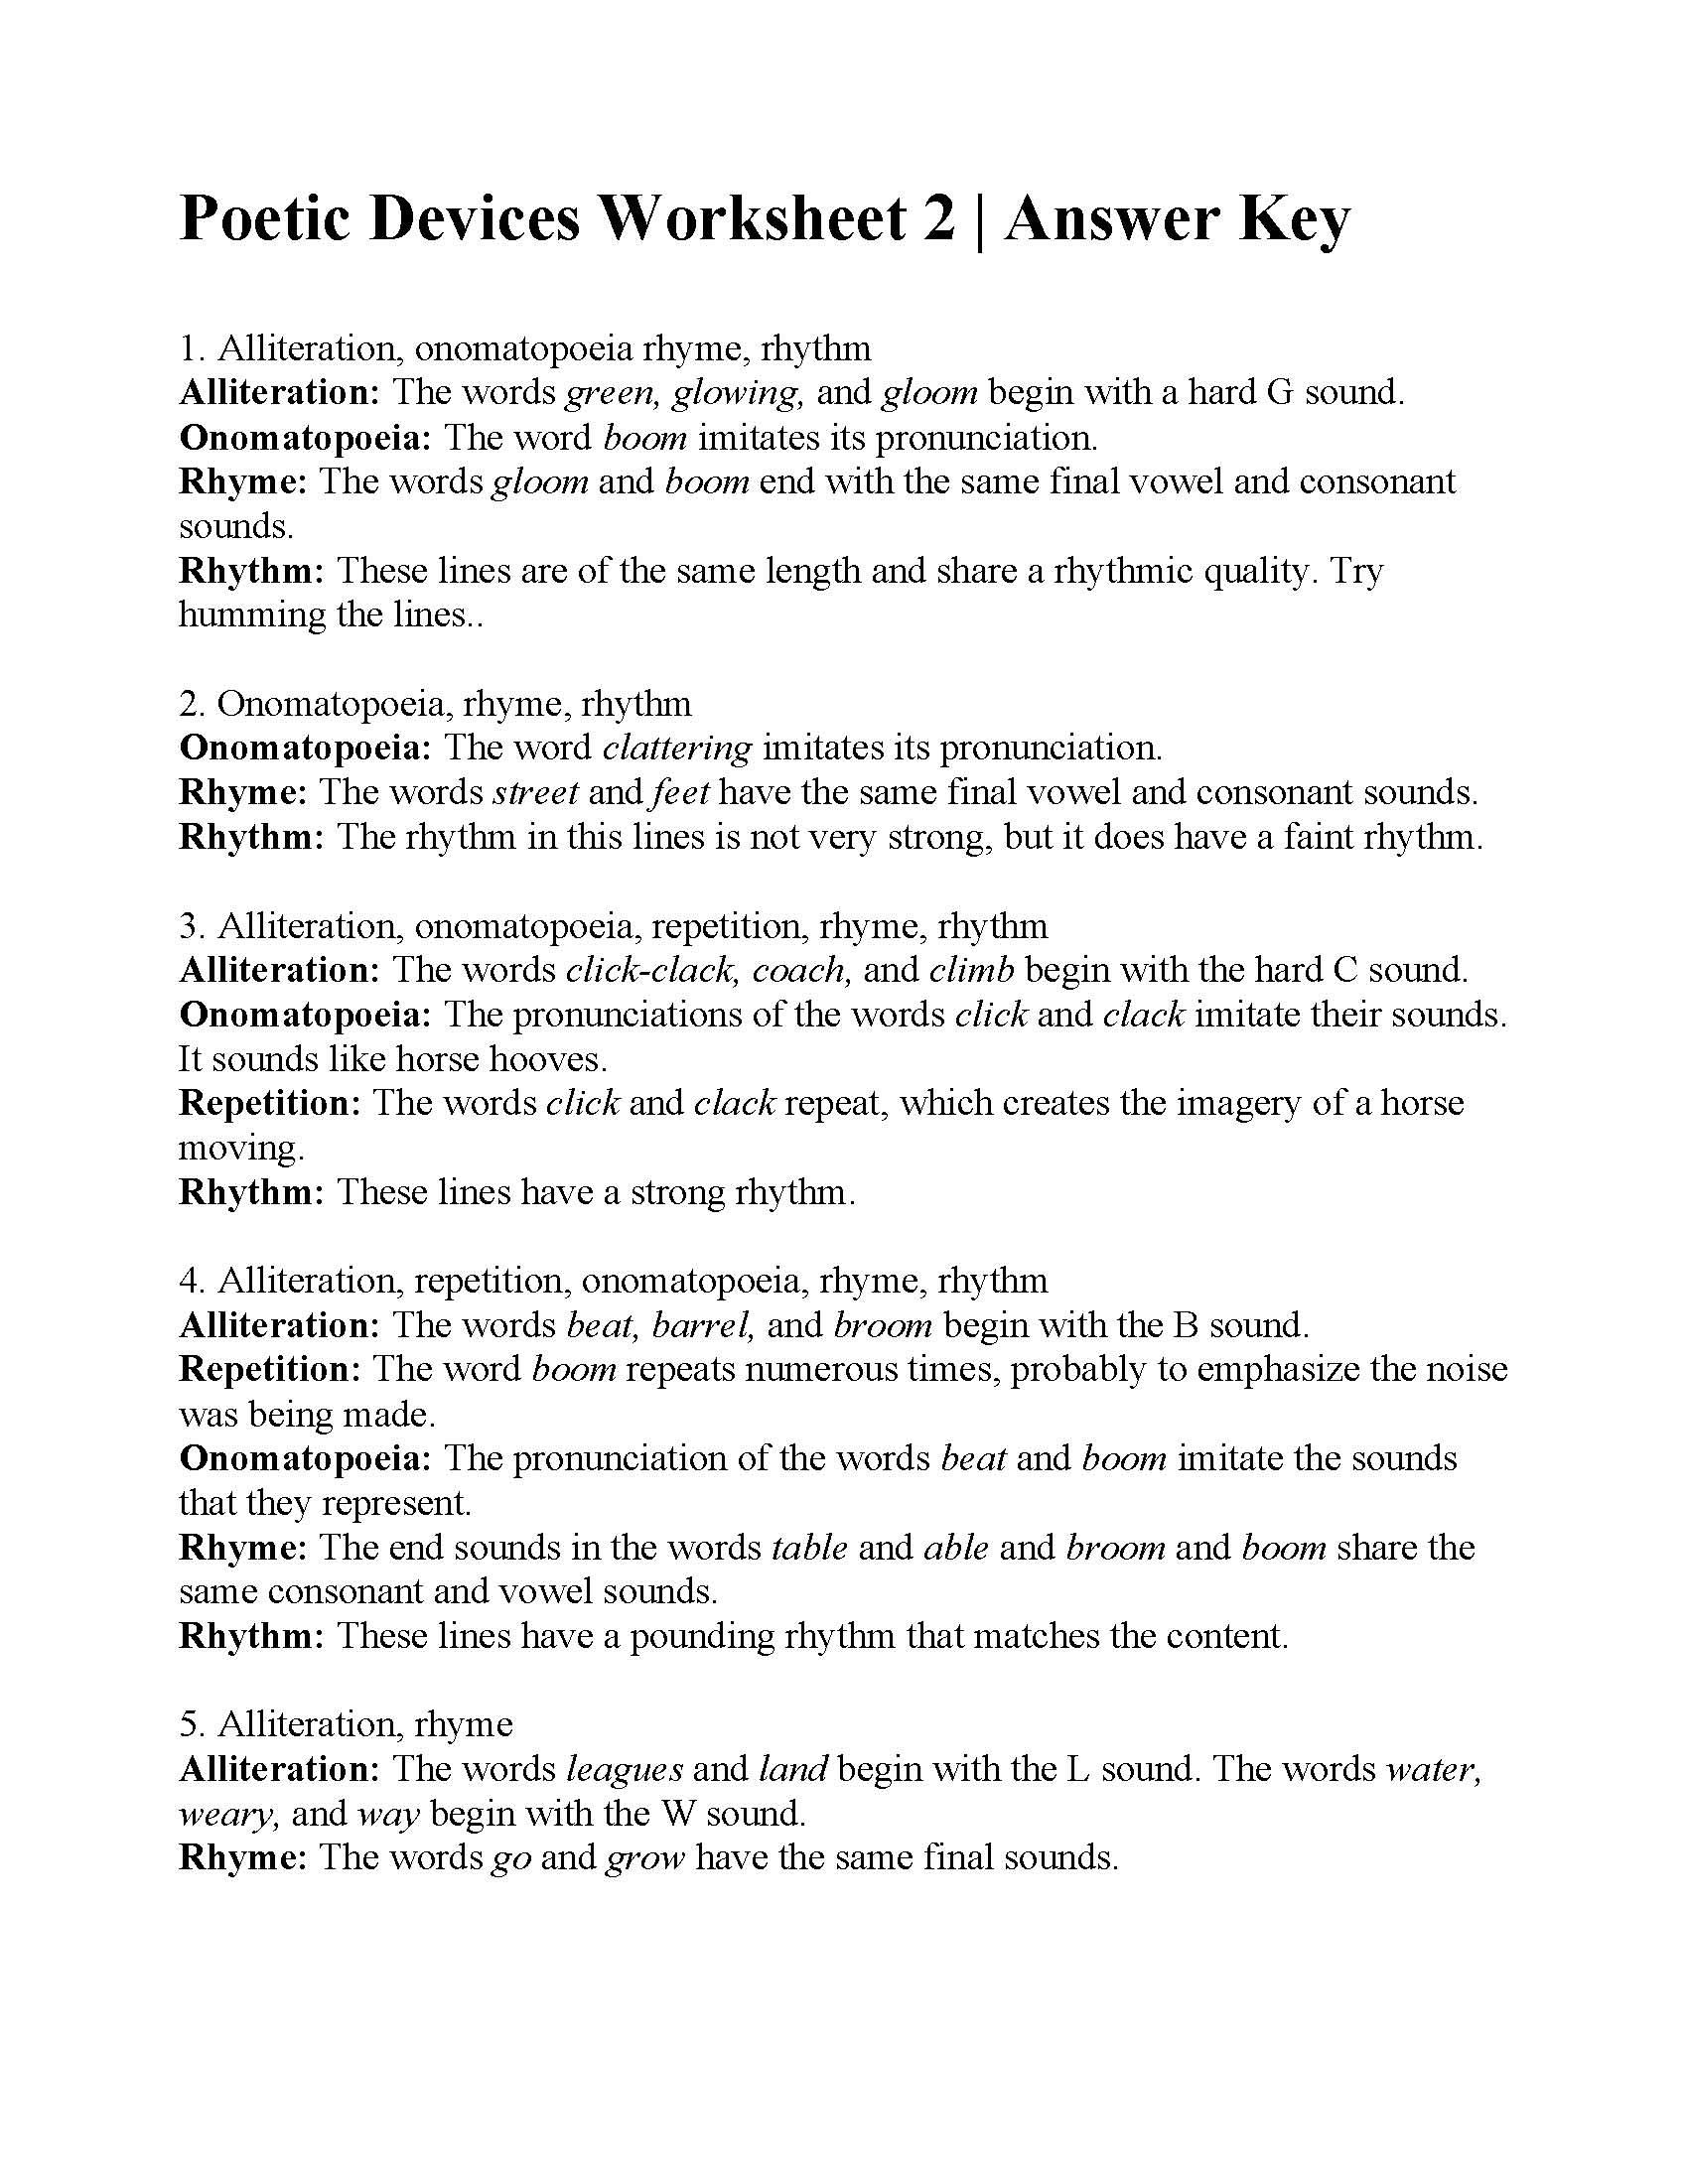 Poetic Devices Worksheet 2